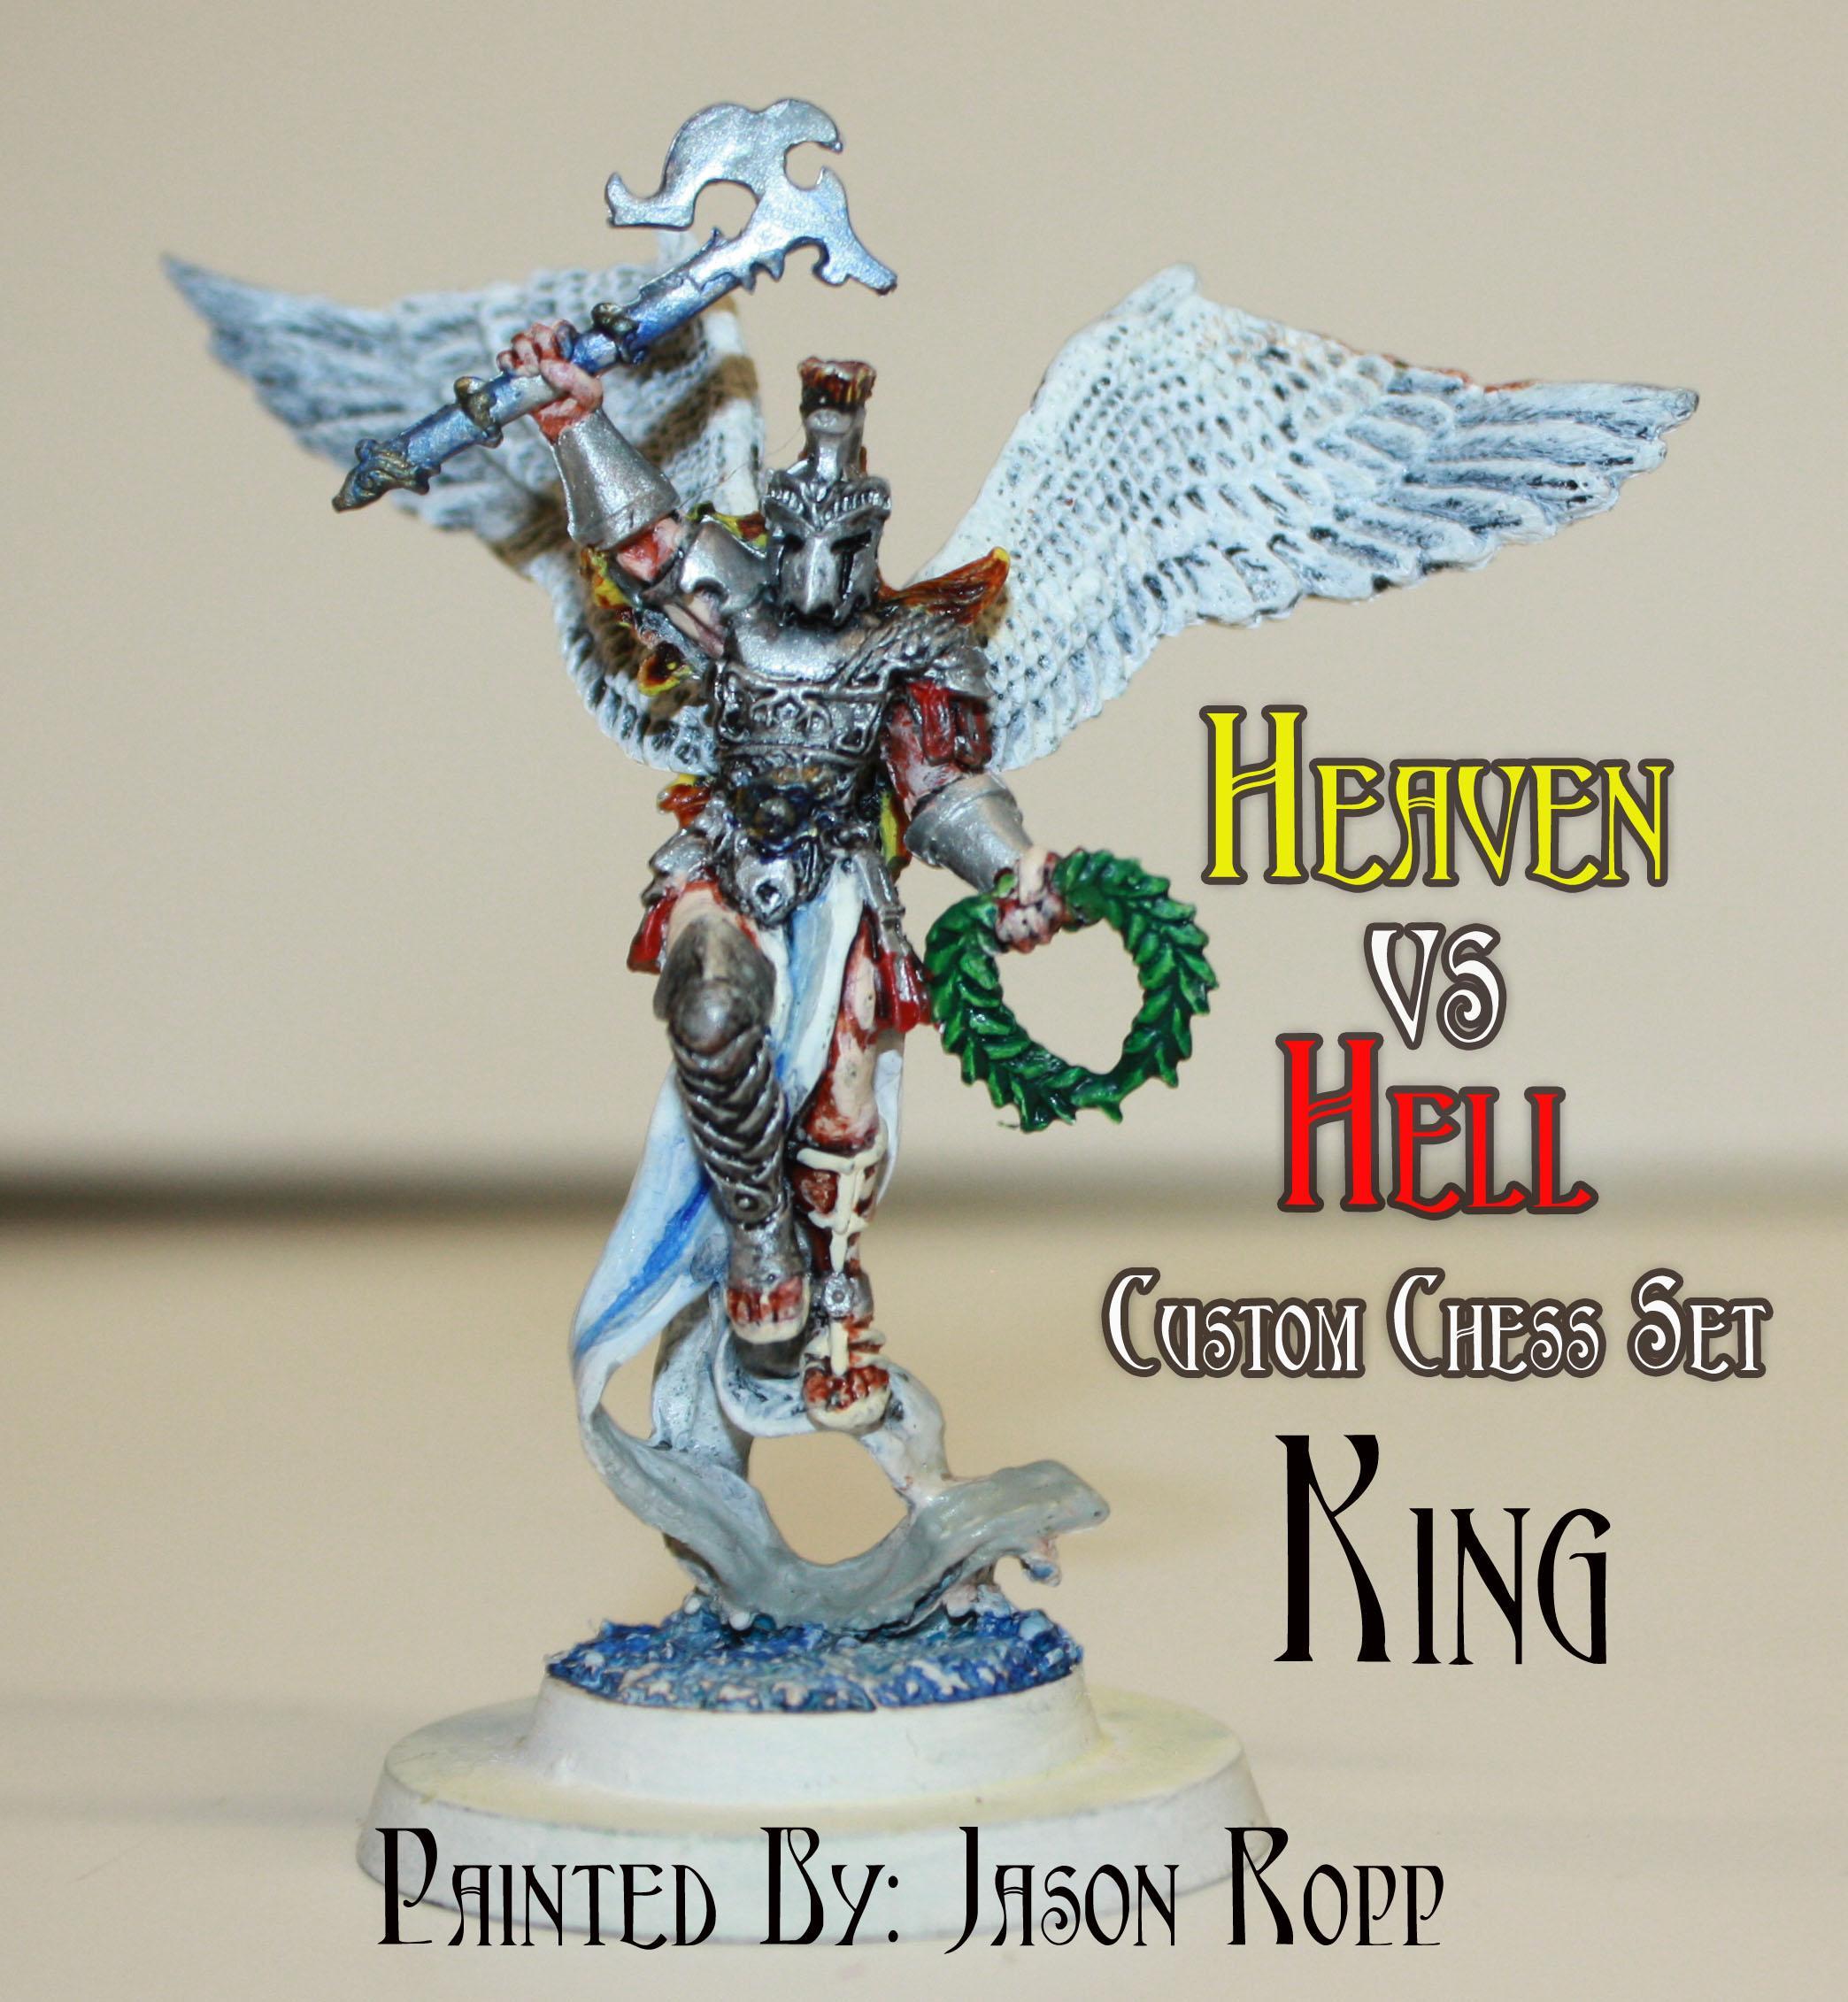 Angel, Bishop, Castle, Chess, Custom, Daemons, Devils, Dragon, Dugeons And Dragons, Dungeons And Dragons, Heavan, Hell, King, Knights, Nightmare Chess, Pawn, Queen, Rook, Set, Succubus, Vs, Warhammer Fantasy